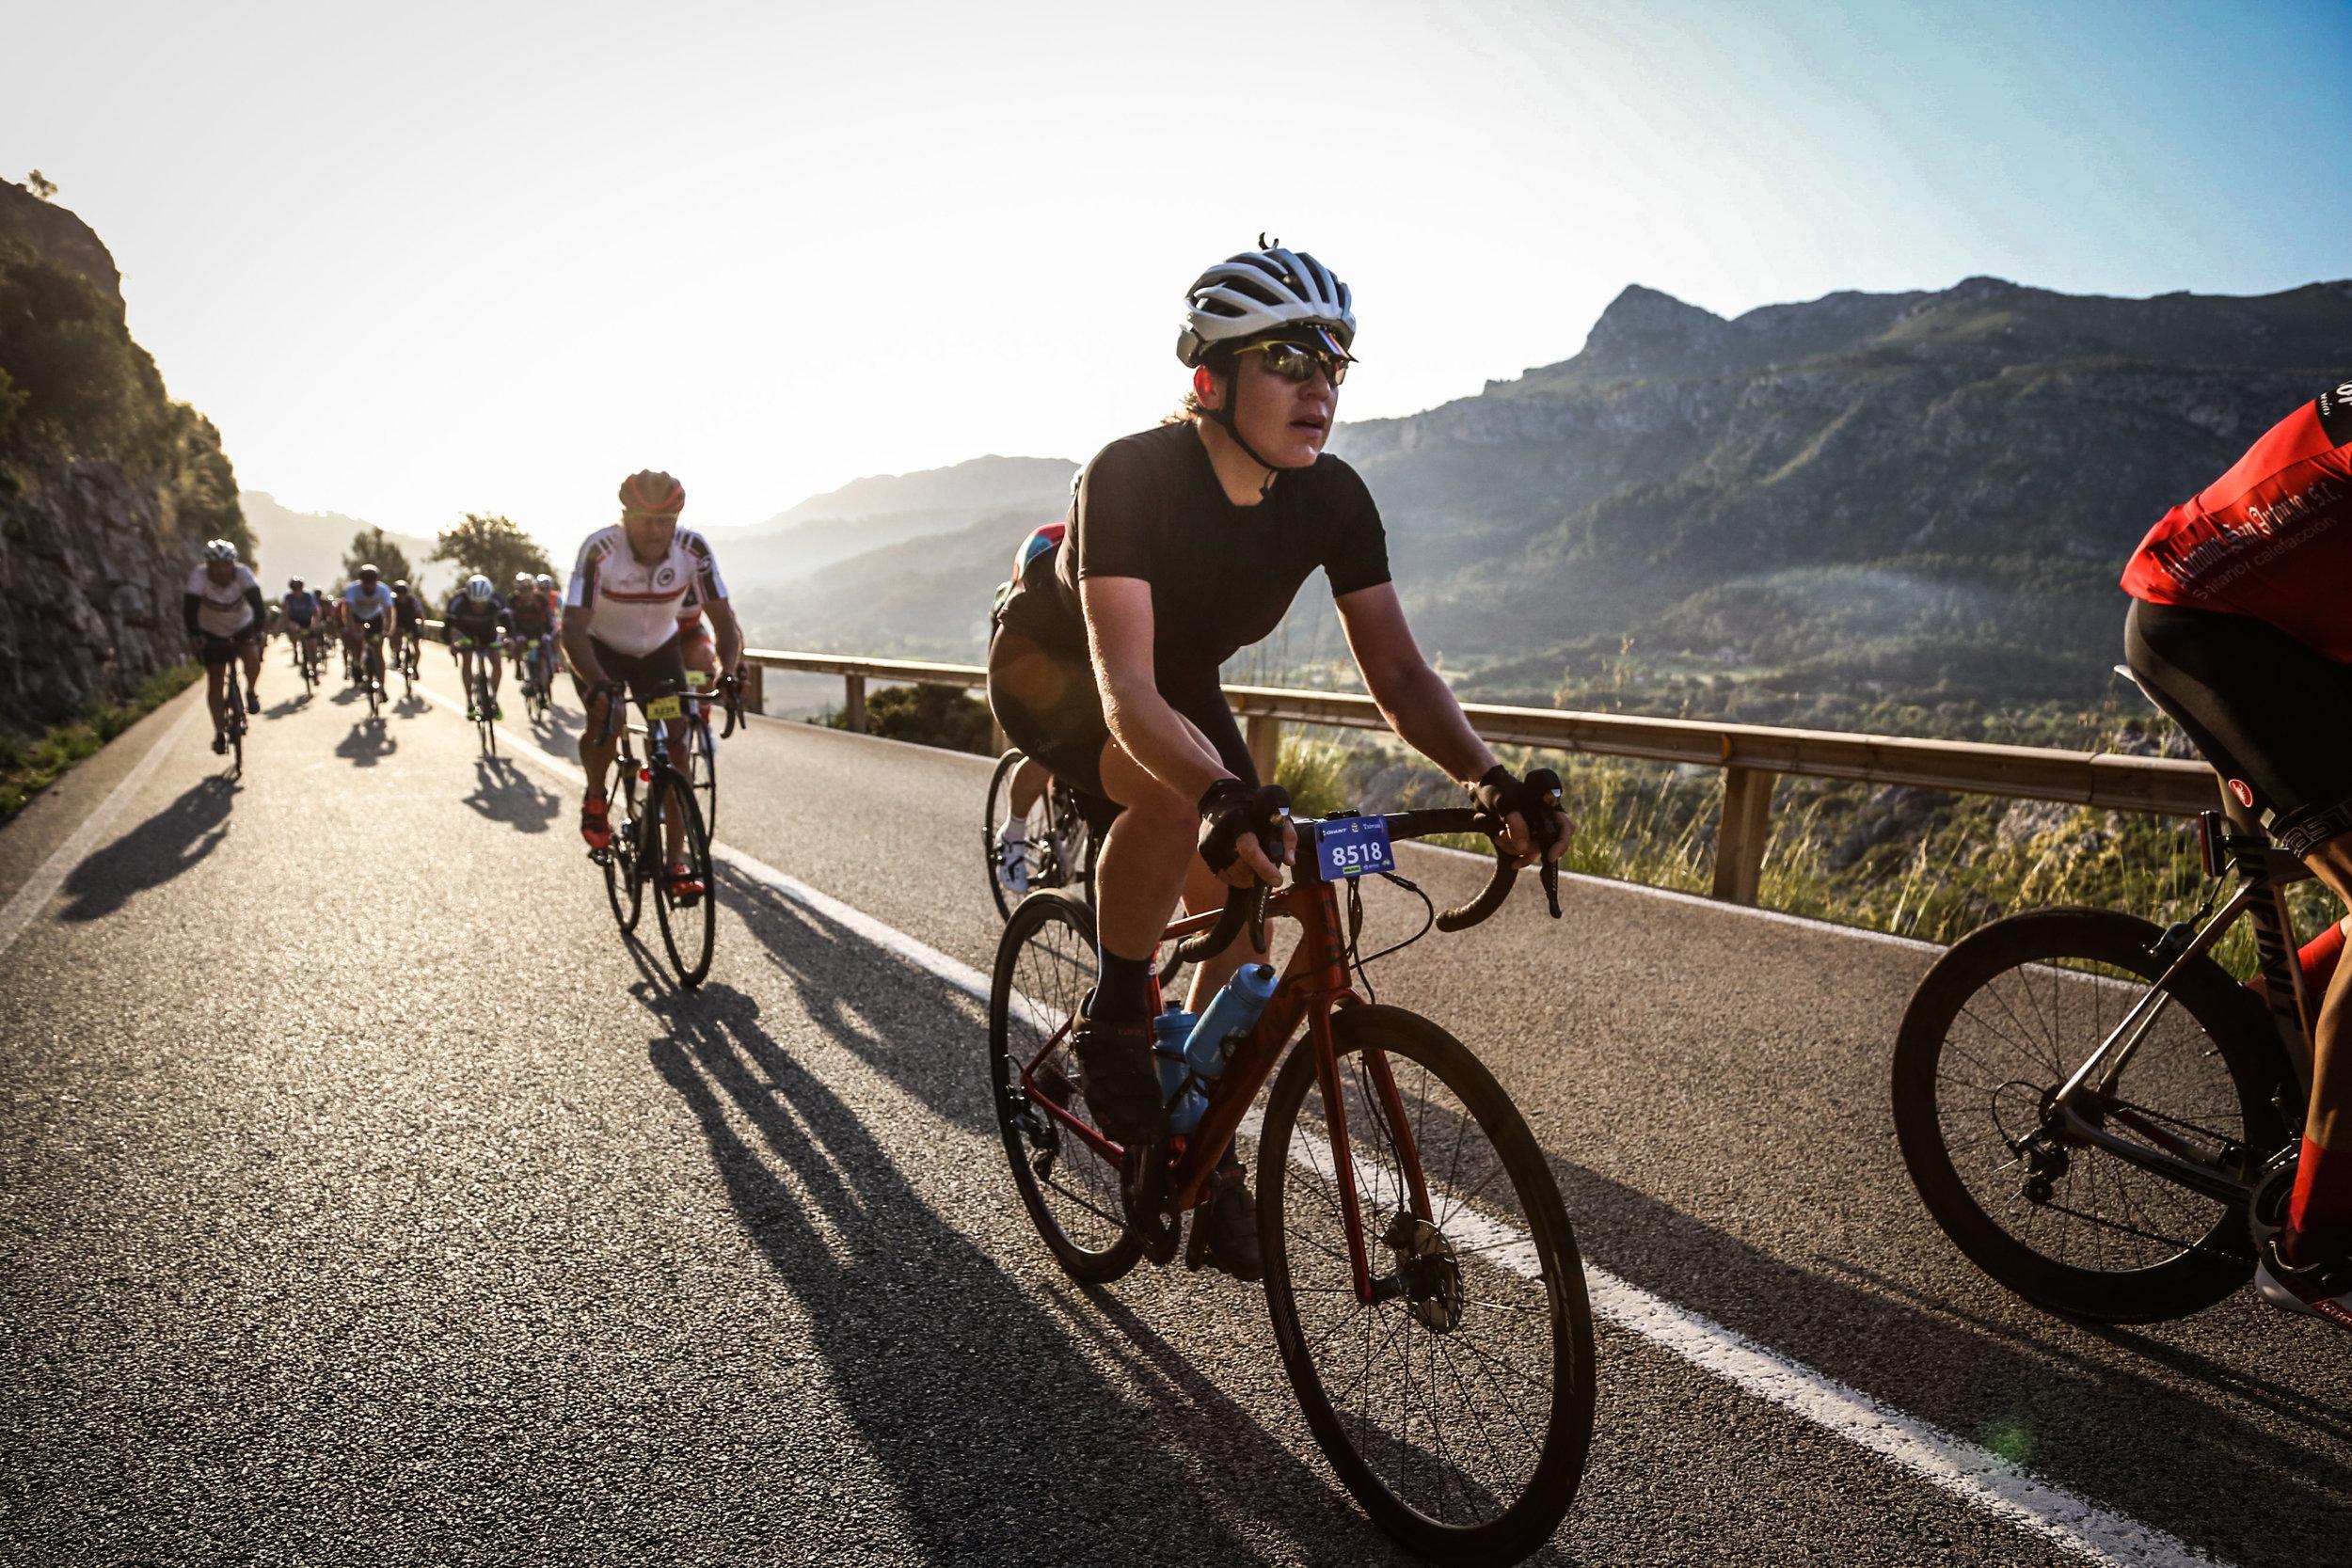 sportograf-WOMENS_CYCLING_EMILY_CHAPPEL.jpg